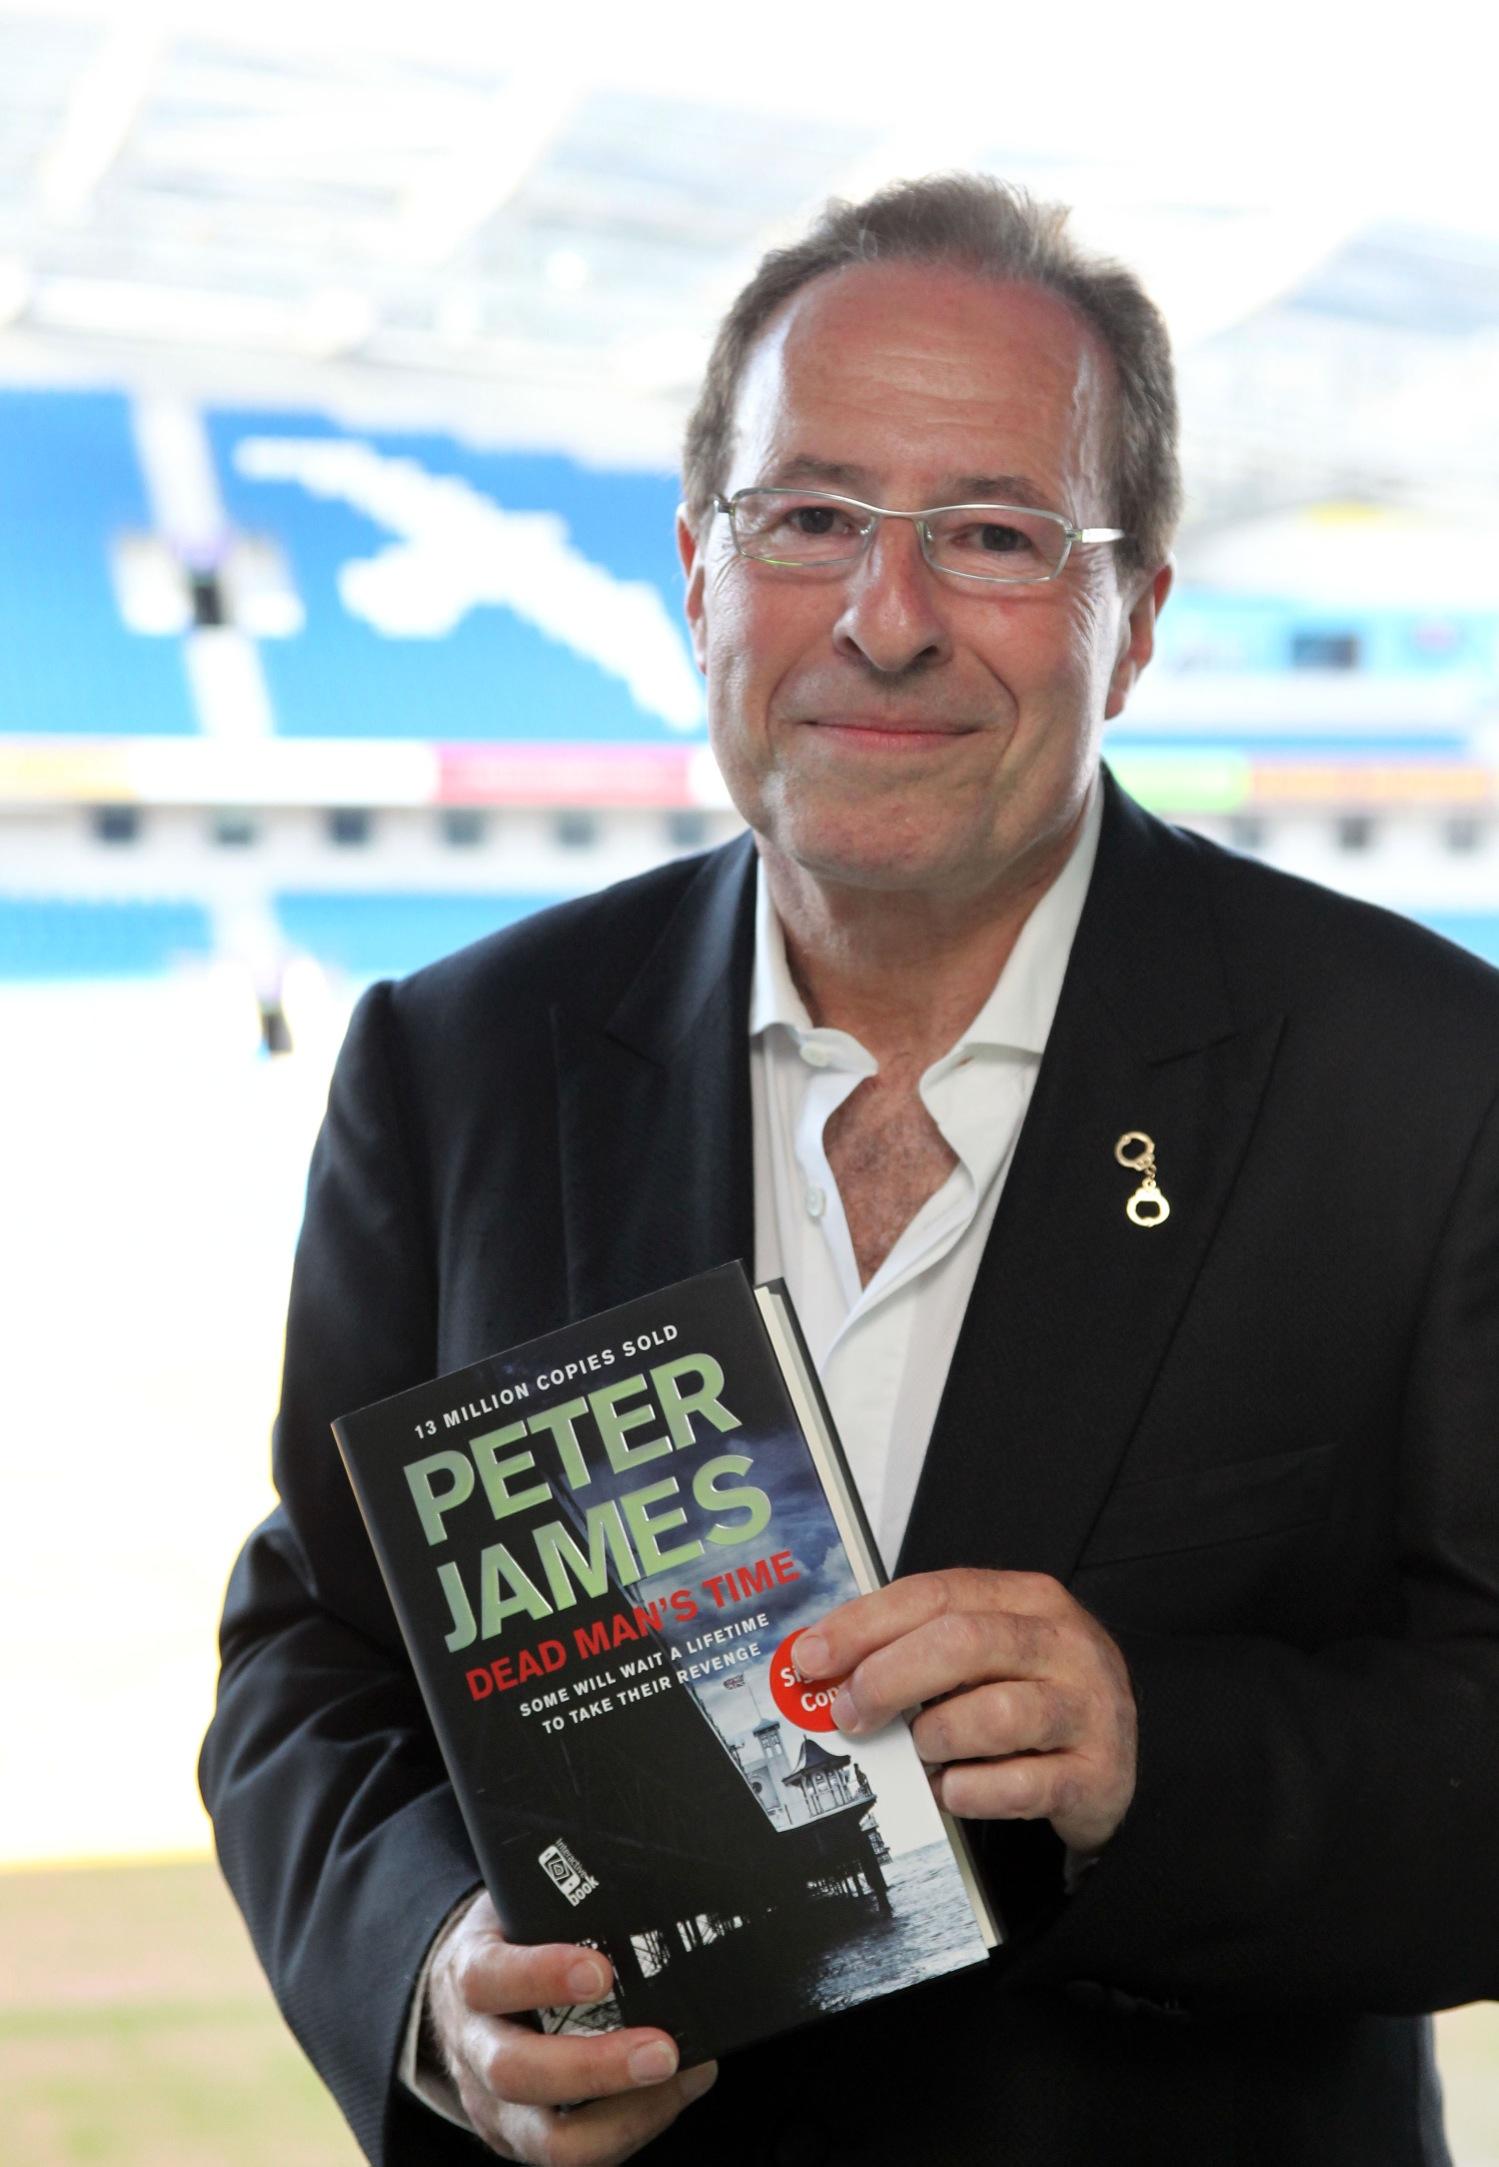 Peter James Net Worth